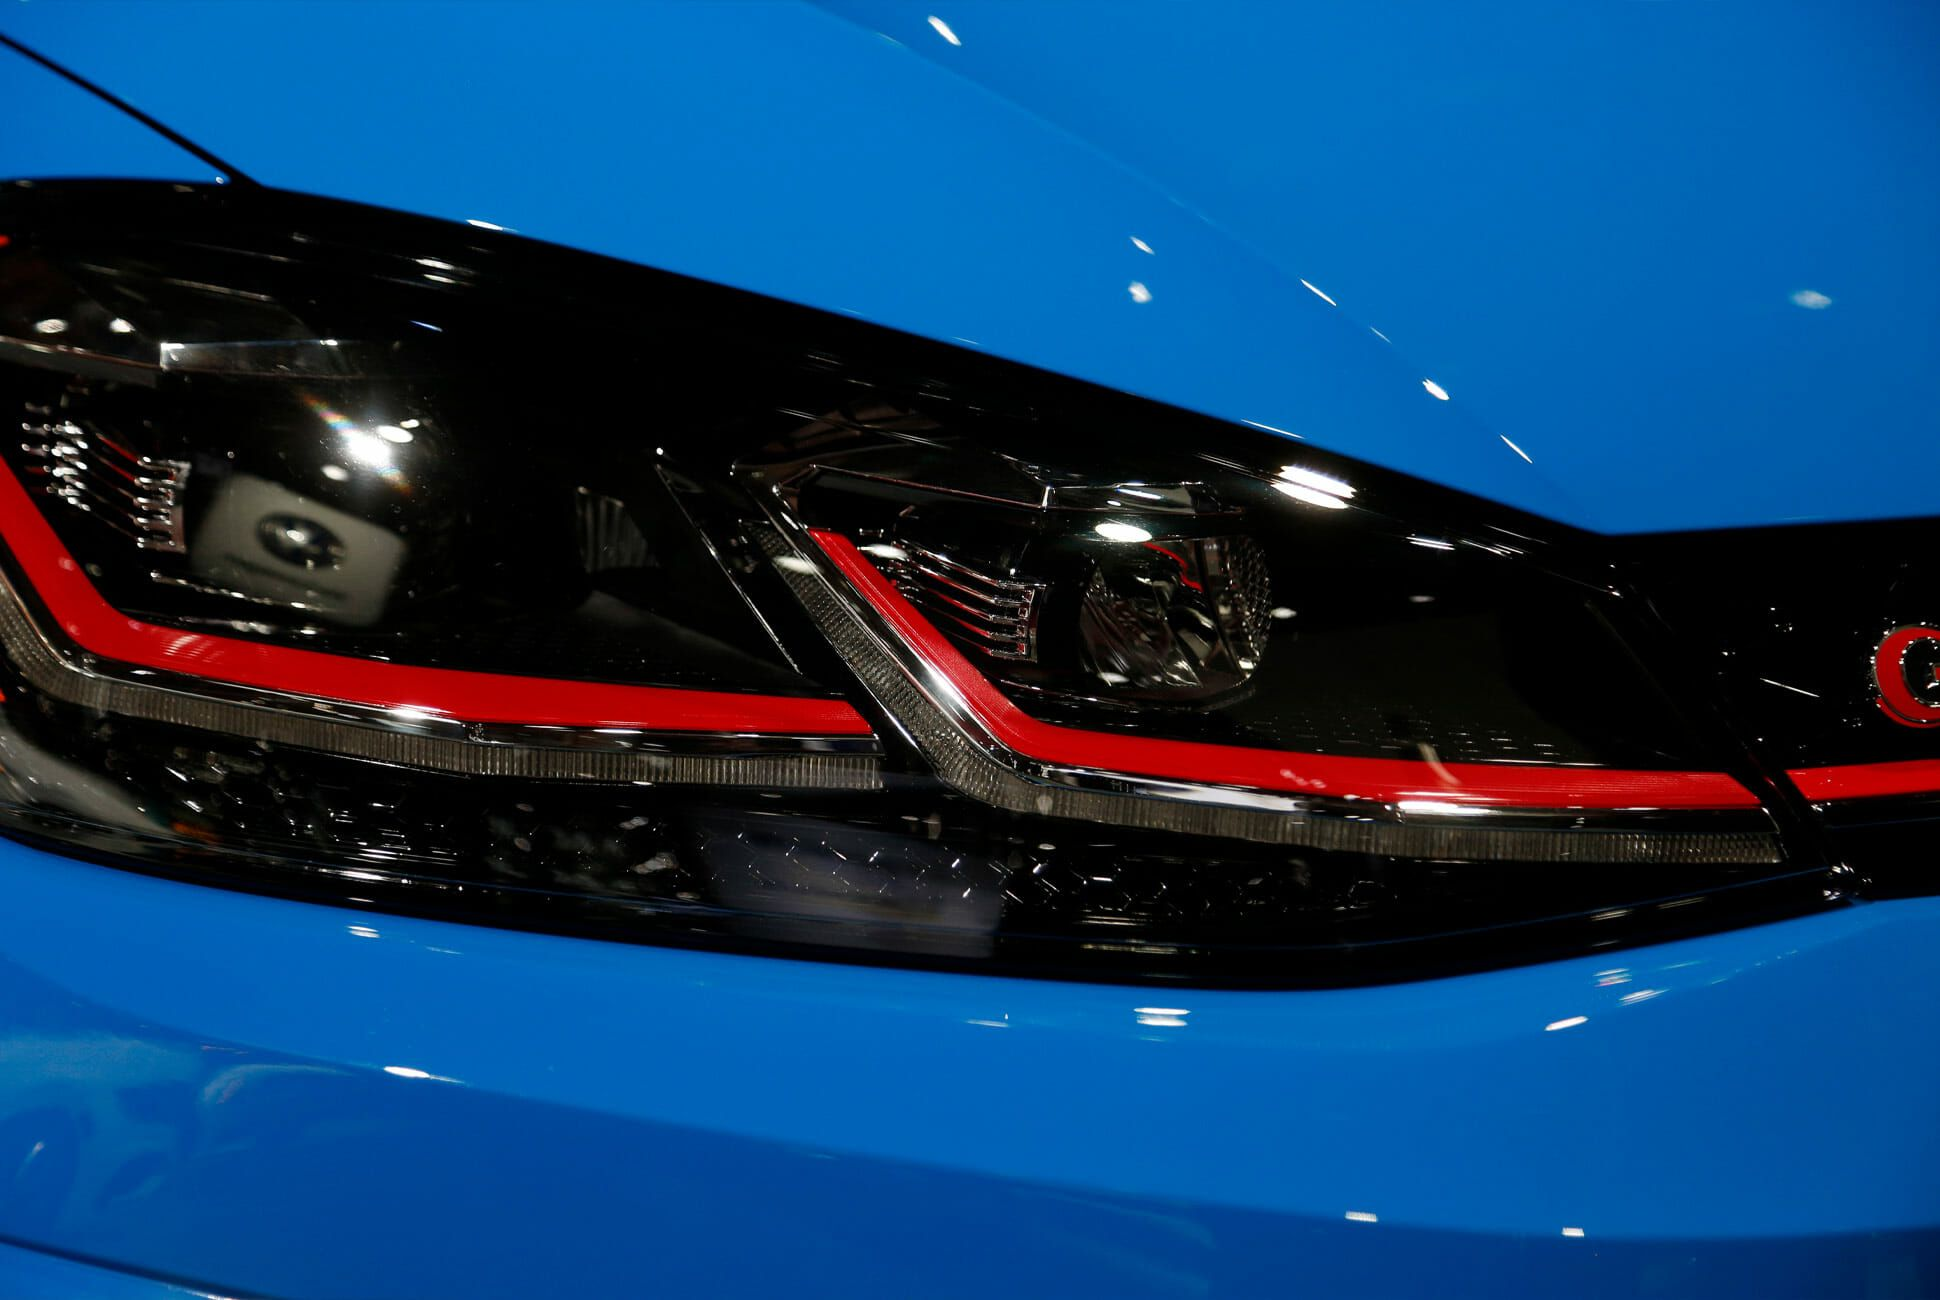 DAS-Best-Details-Gear-Patrol-GTI-Slide-2